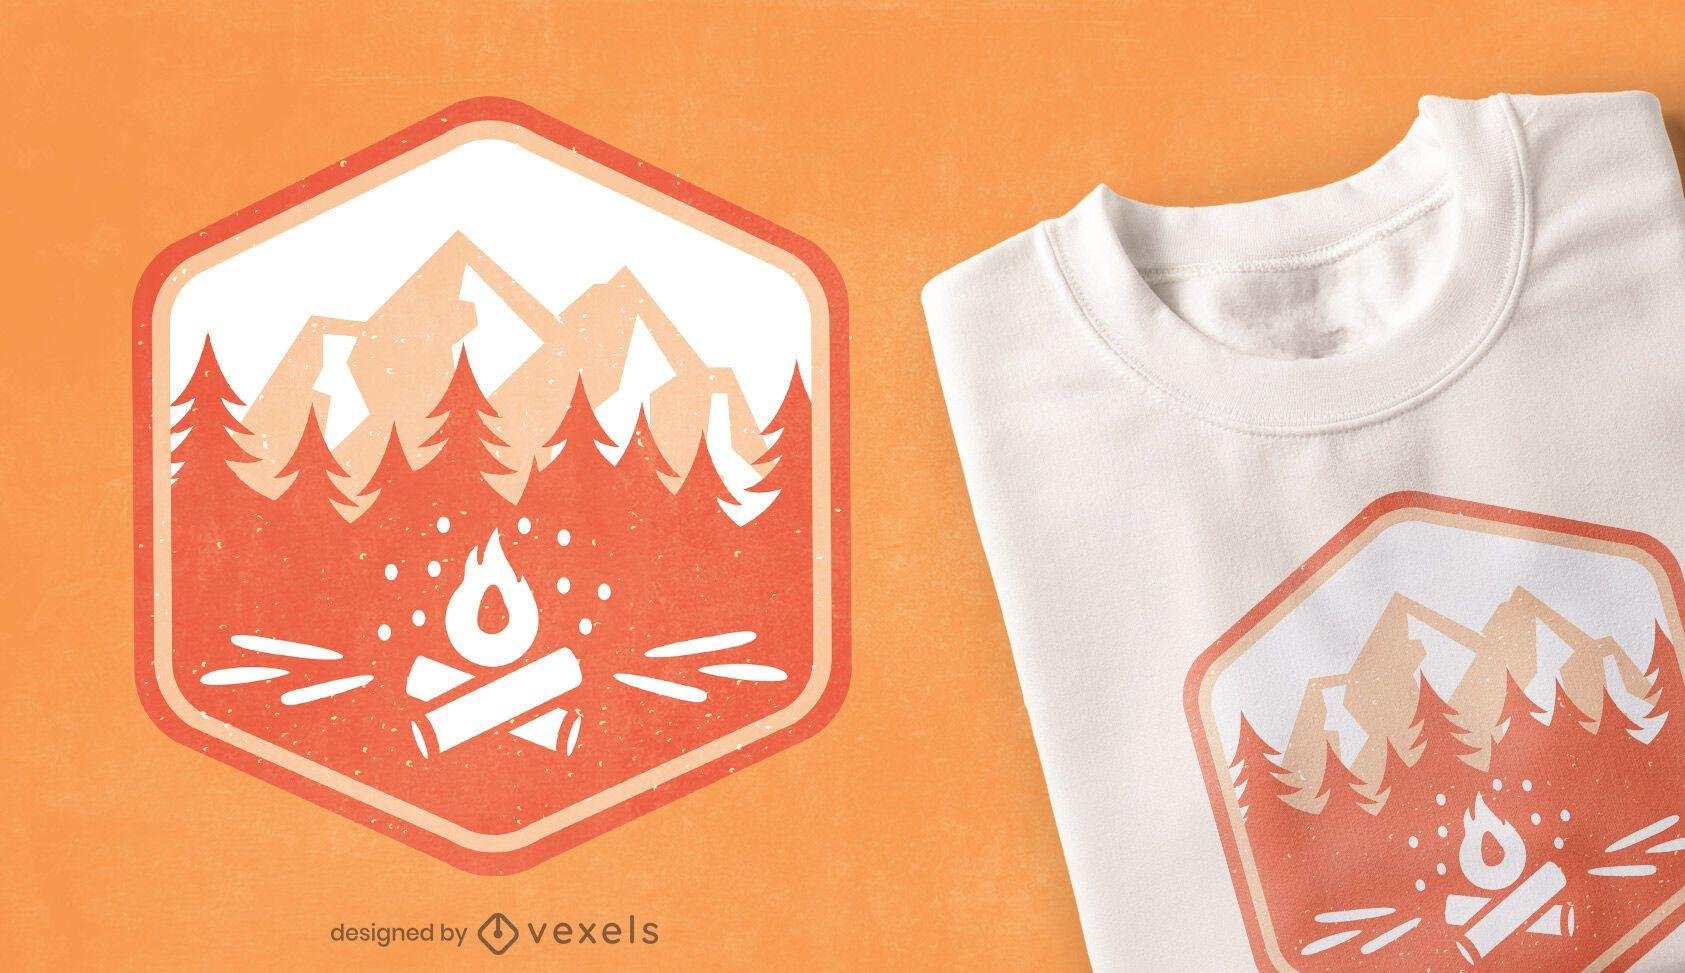 Camping Abzeichen T-Shirt Design